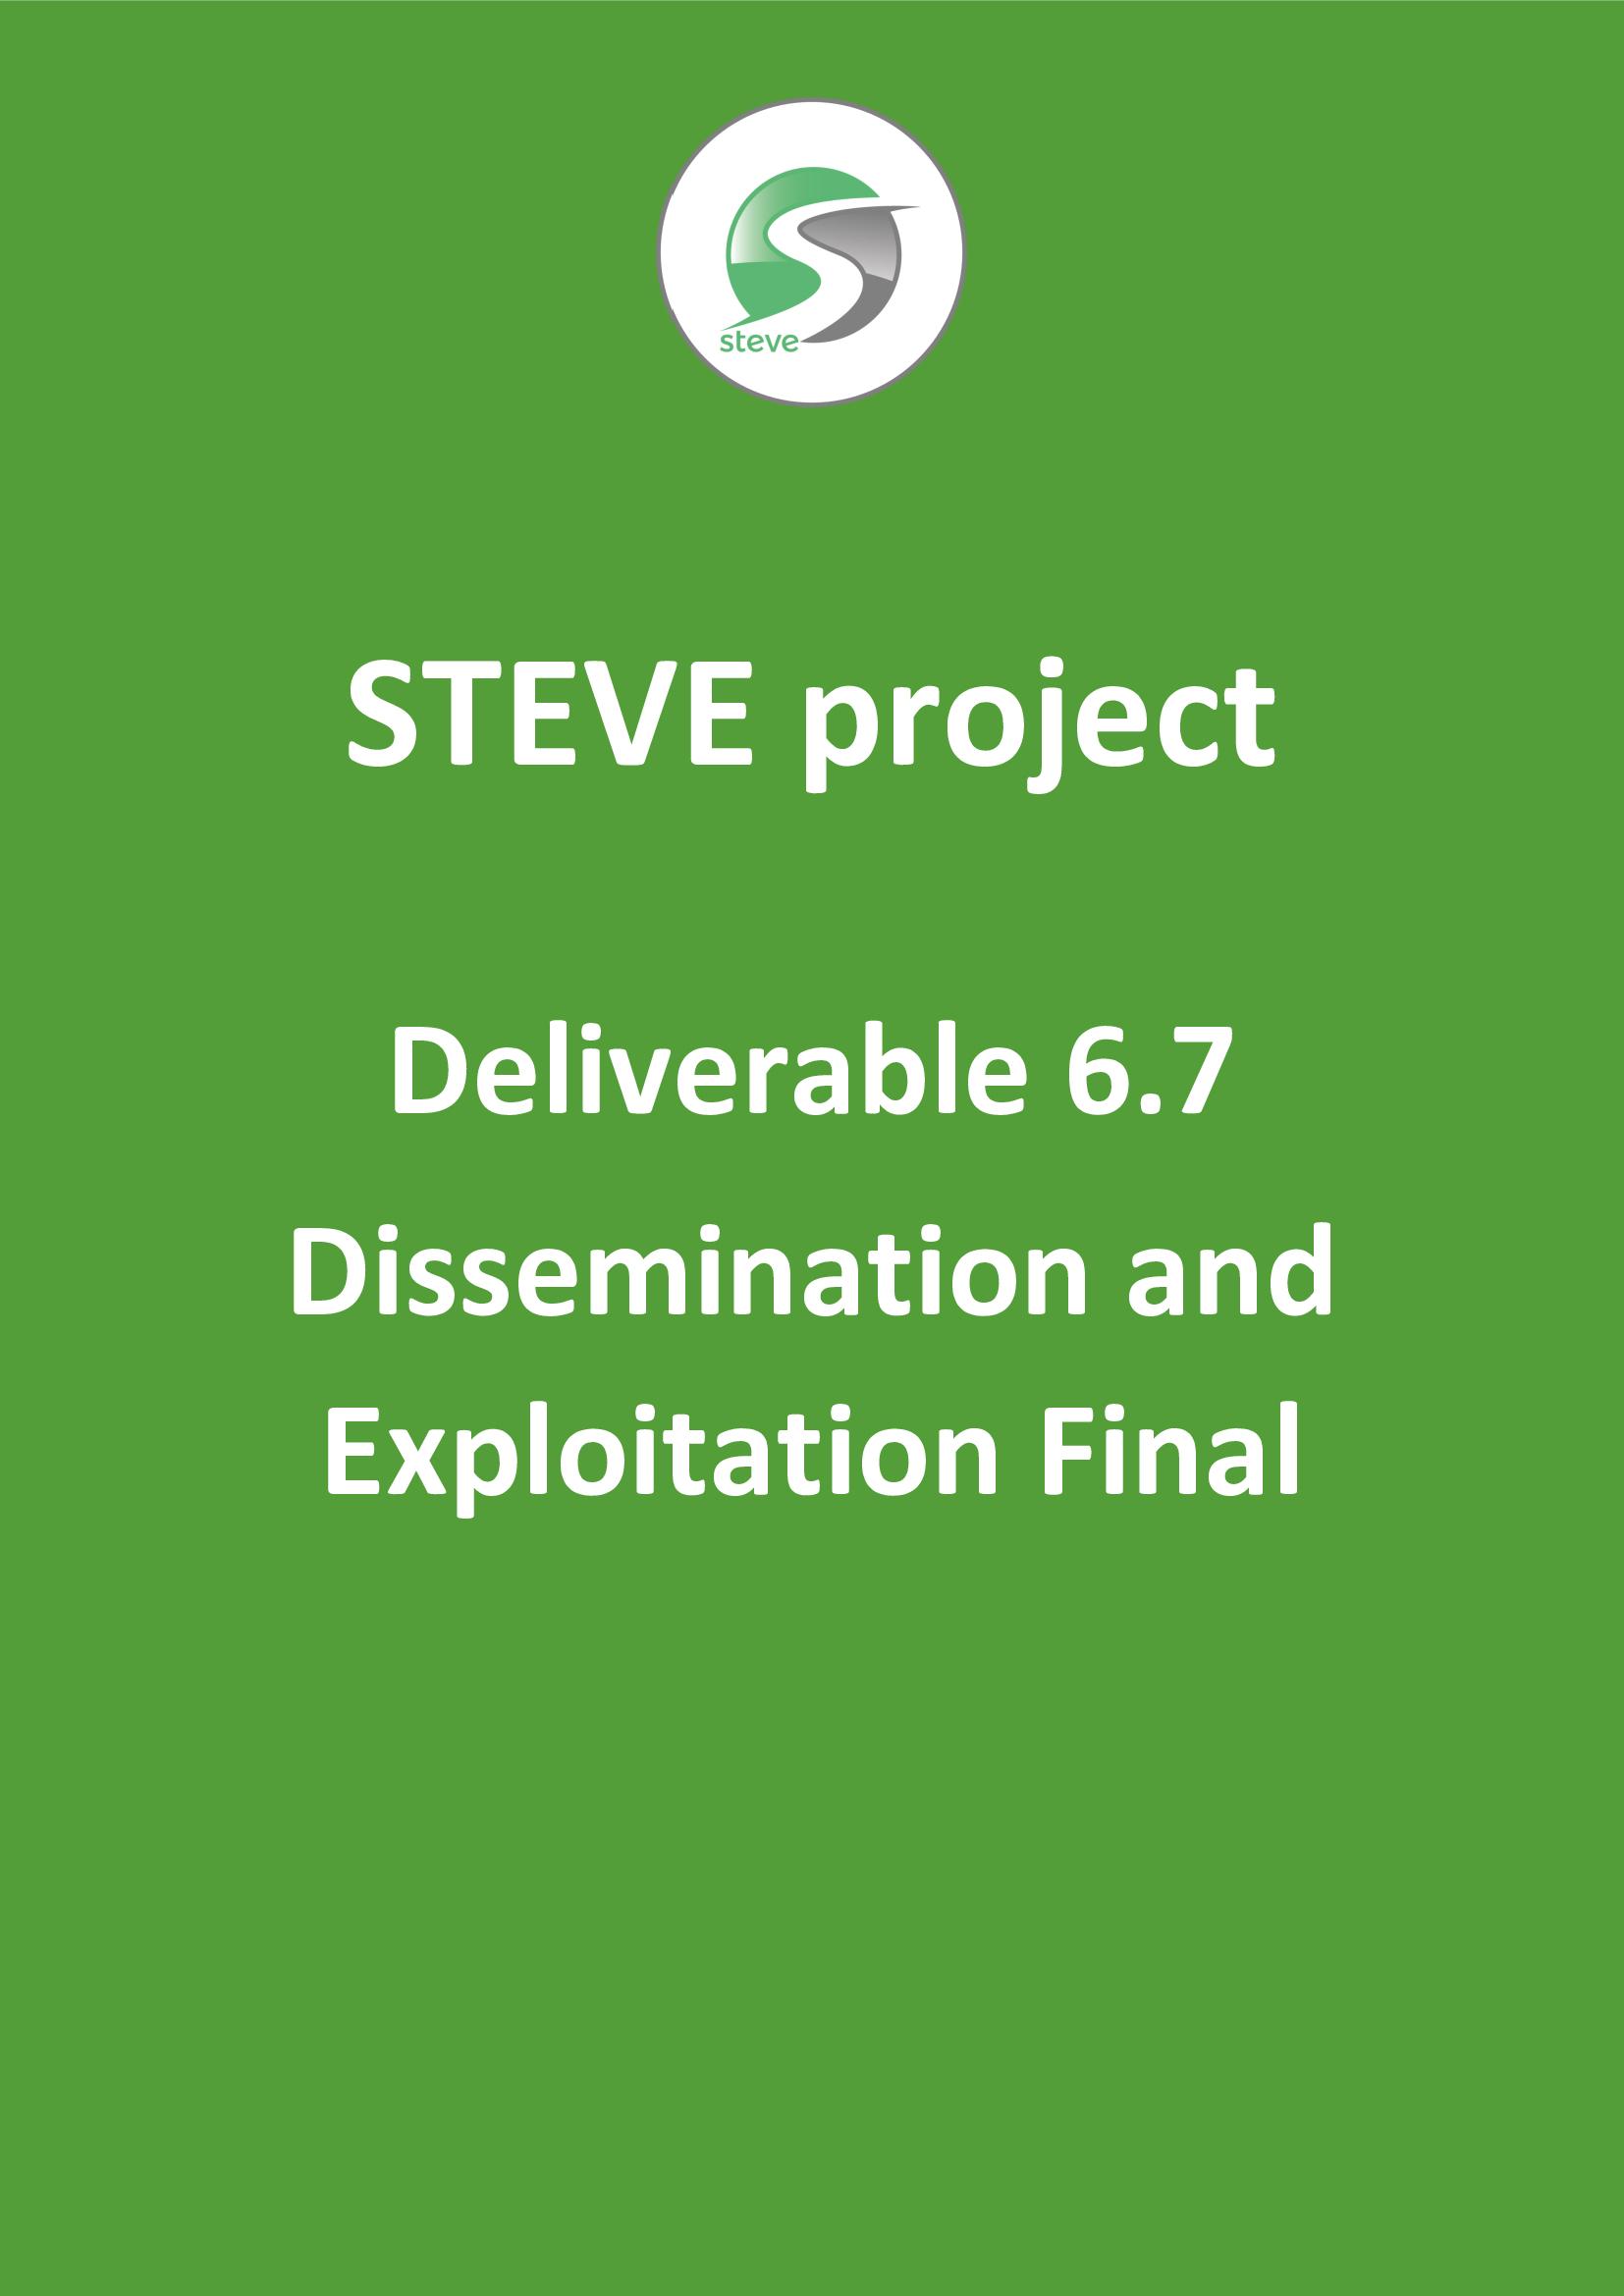 Deliverable 6.7